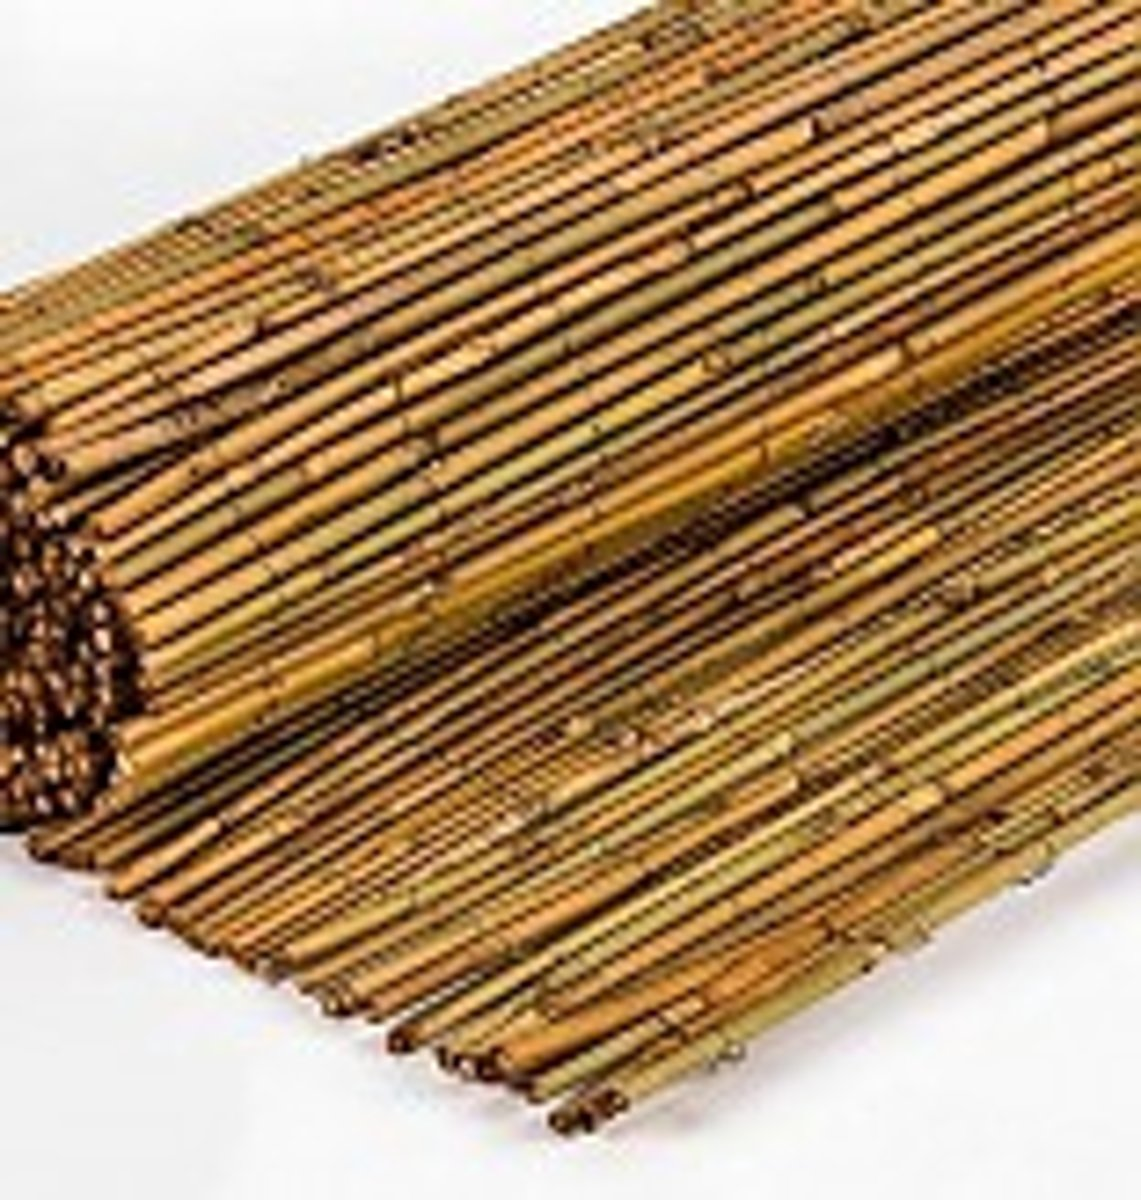 Bamboemat ca: 10-12 mm dik 100 x 300 cm kopen